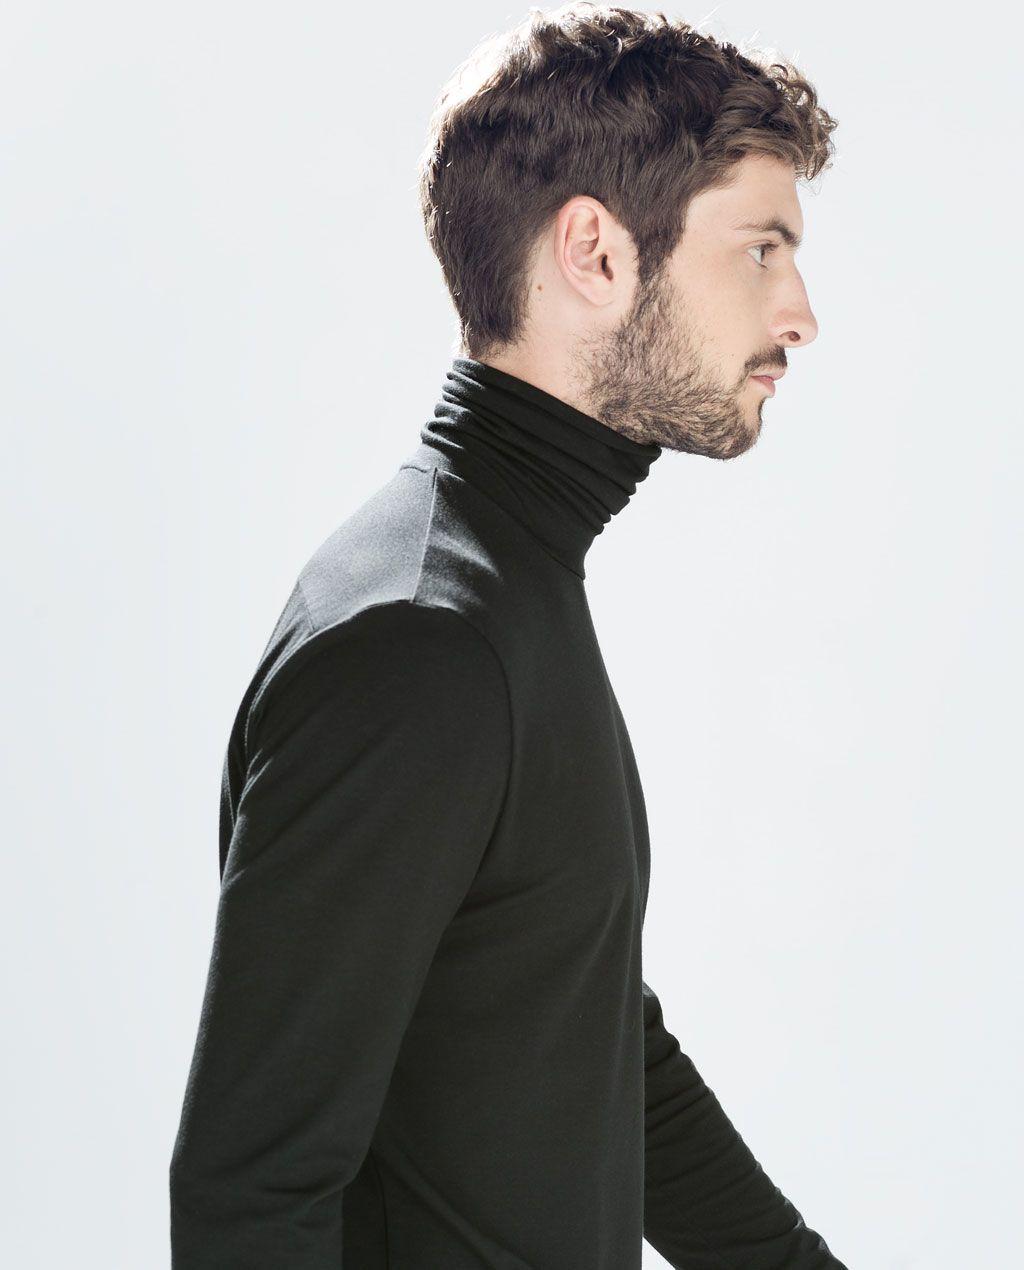 c3a3c952 ZARA - MAN - TURTLENECK T-SHIRT   Man fashion   Turtleneck t shirt ...